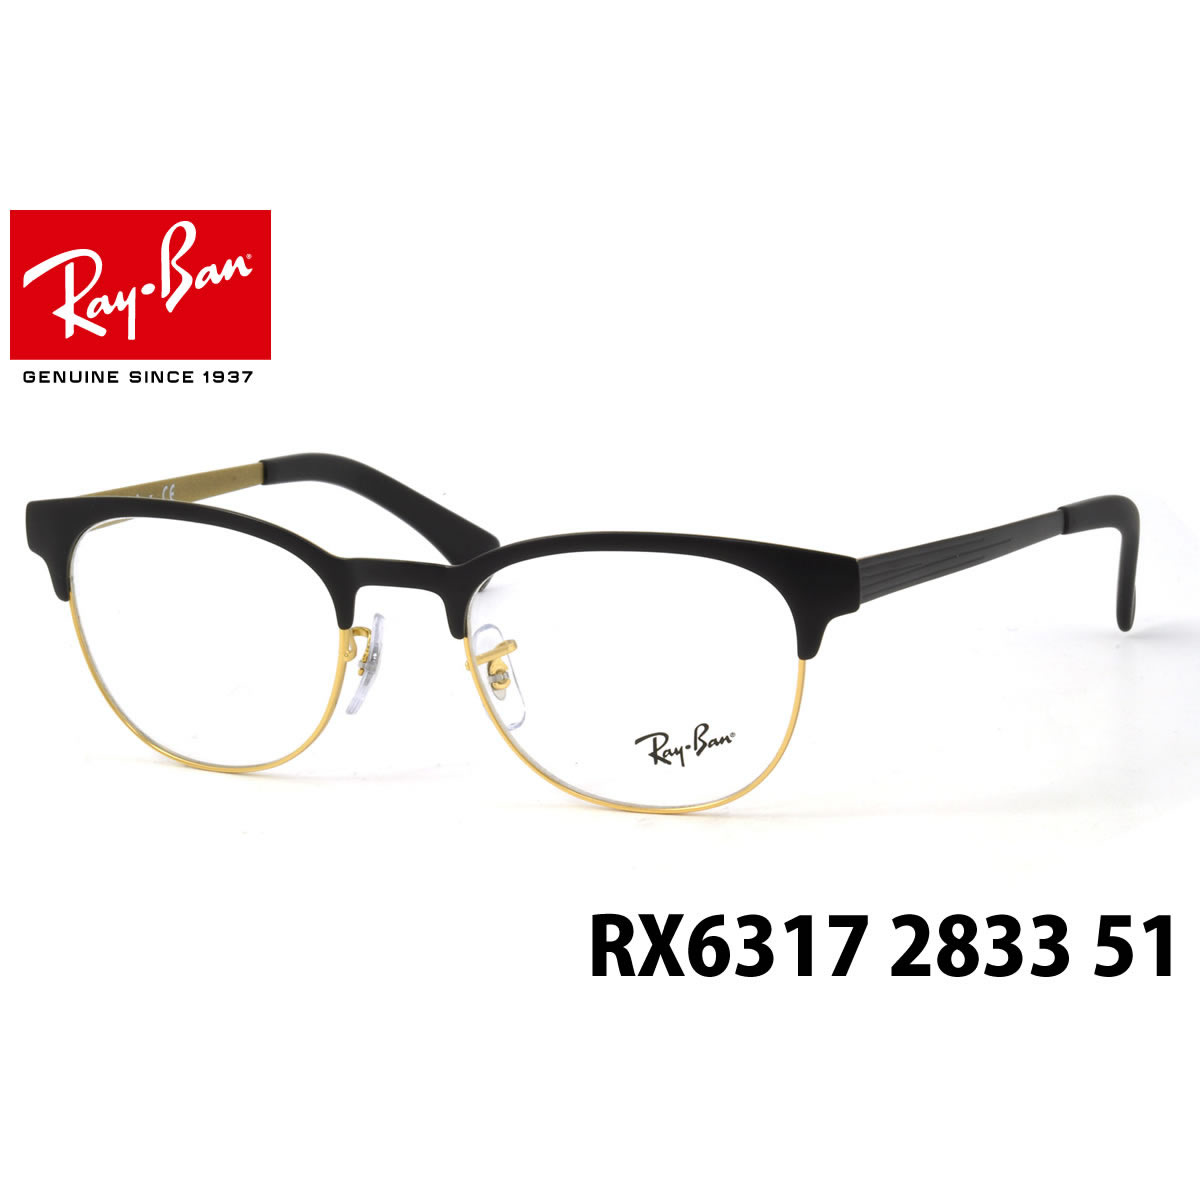 d826ec9f75f ... best ray ban glasses frames rx6317 2833 51 size ray ban rayban mens  womens bc33e 8bbf5